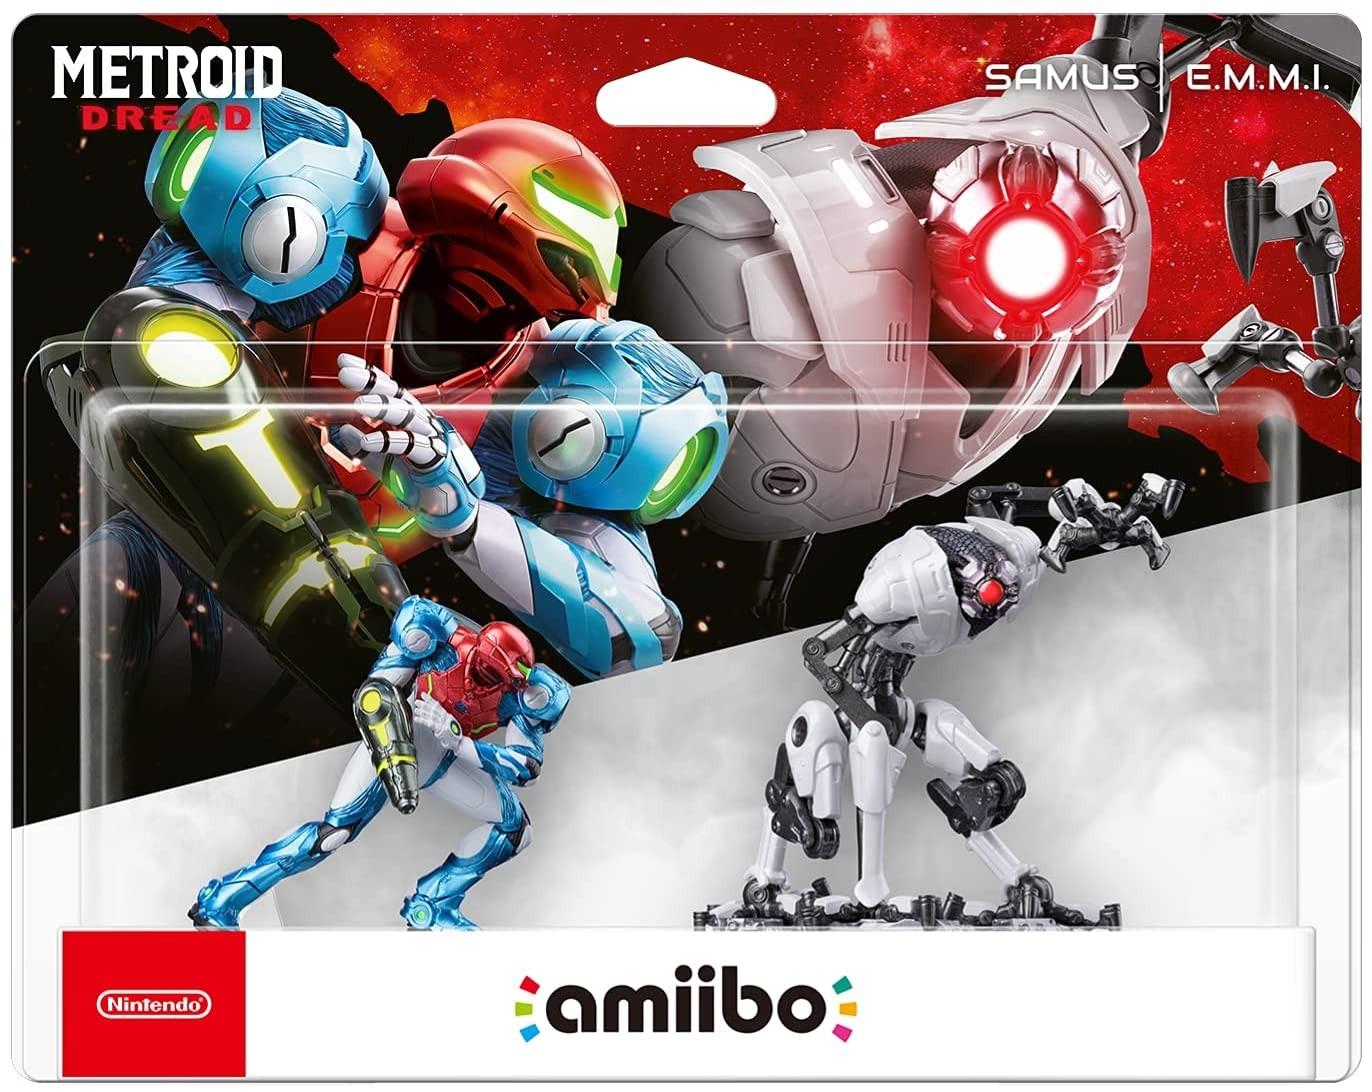 Metroid Dread SAMUS and E.M.M.I. amiibo 2 pack